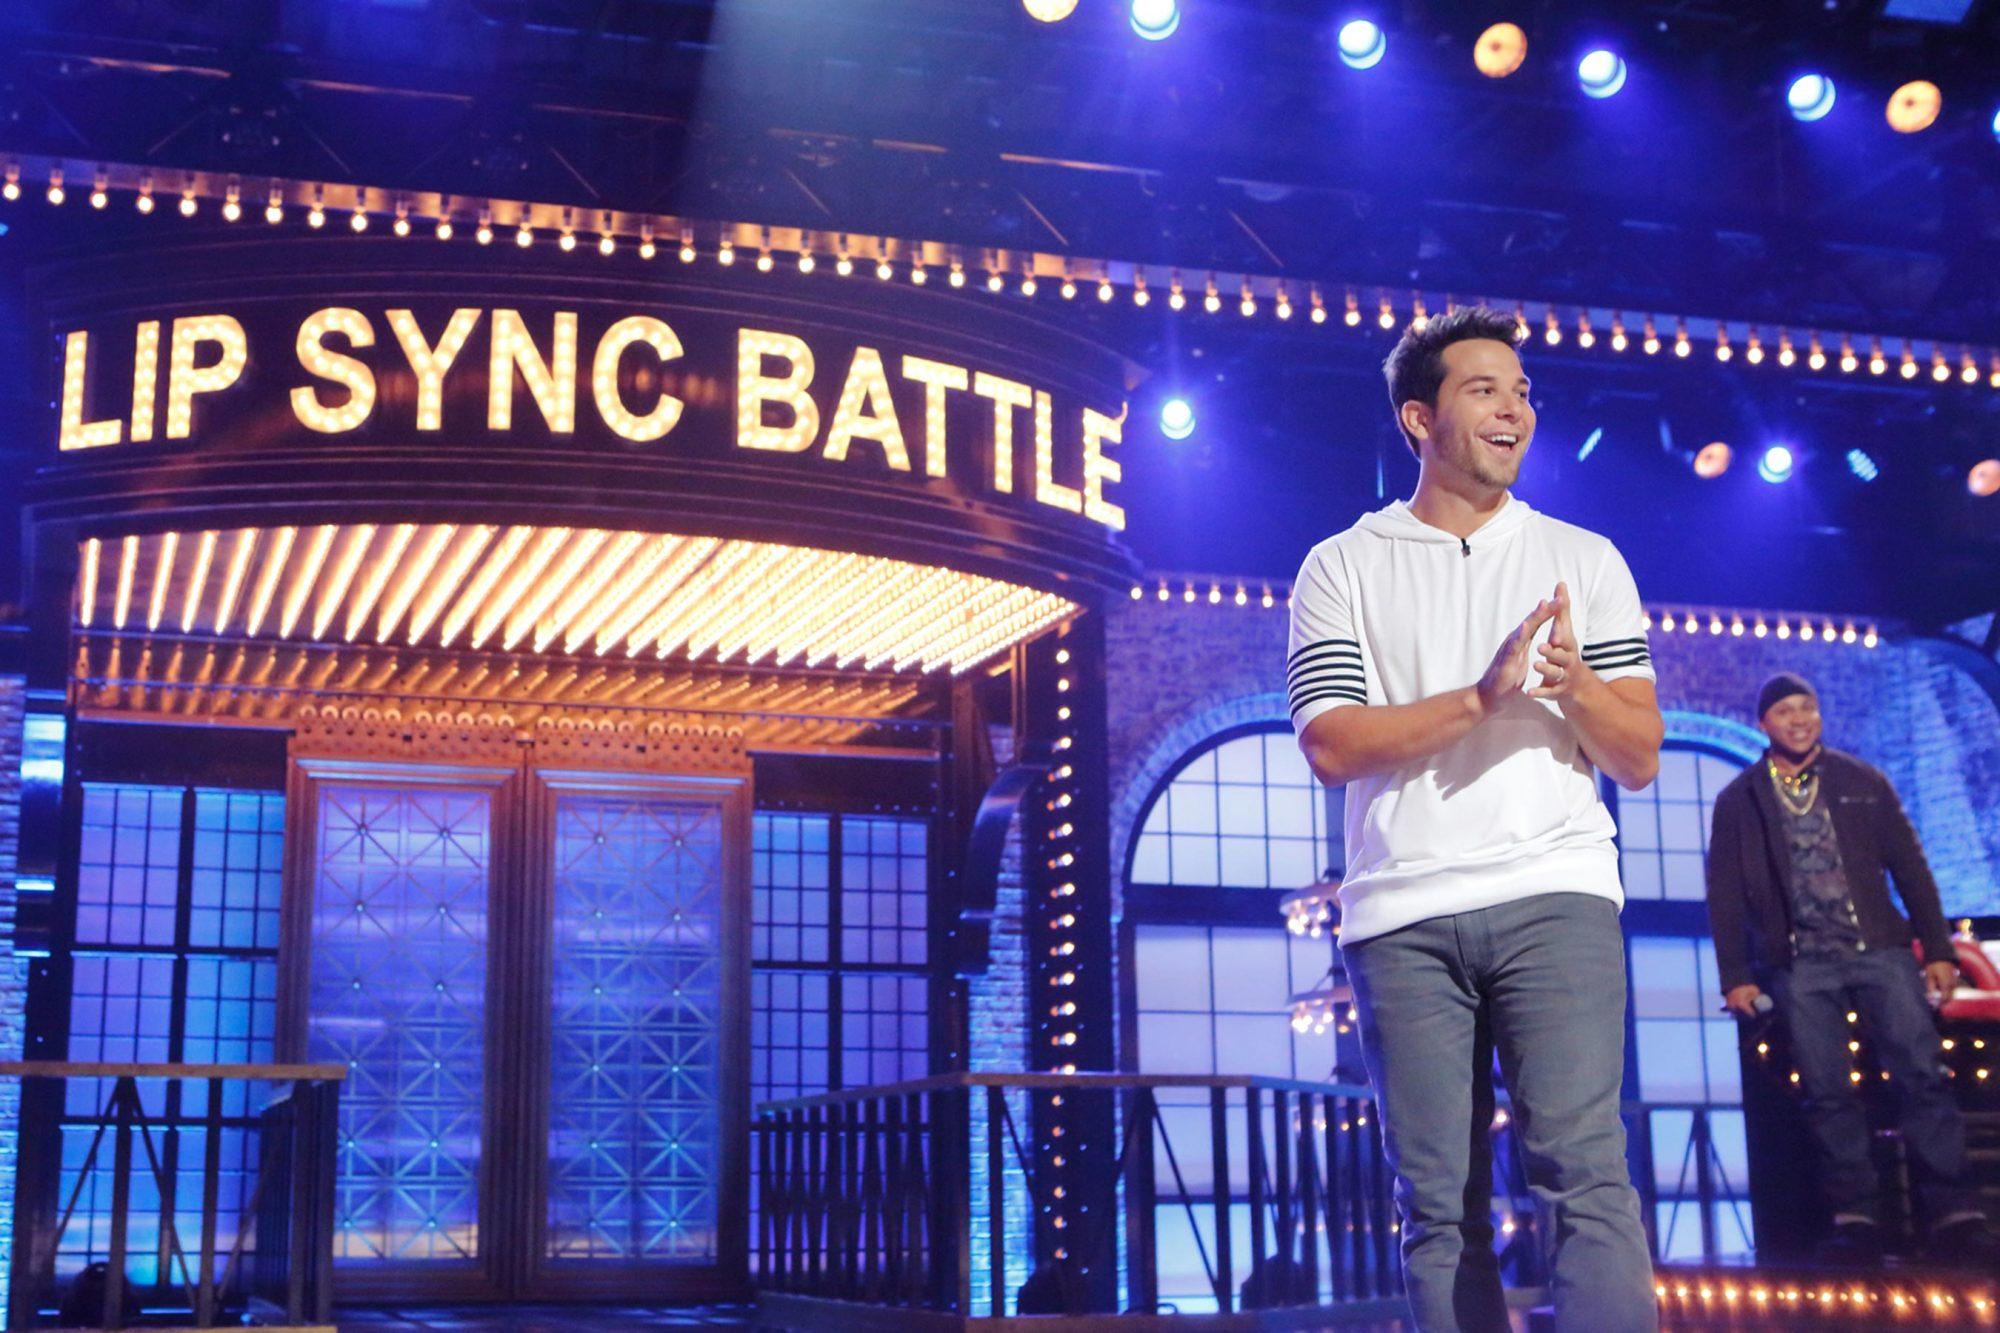 Lip Sync Battle 3